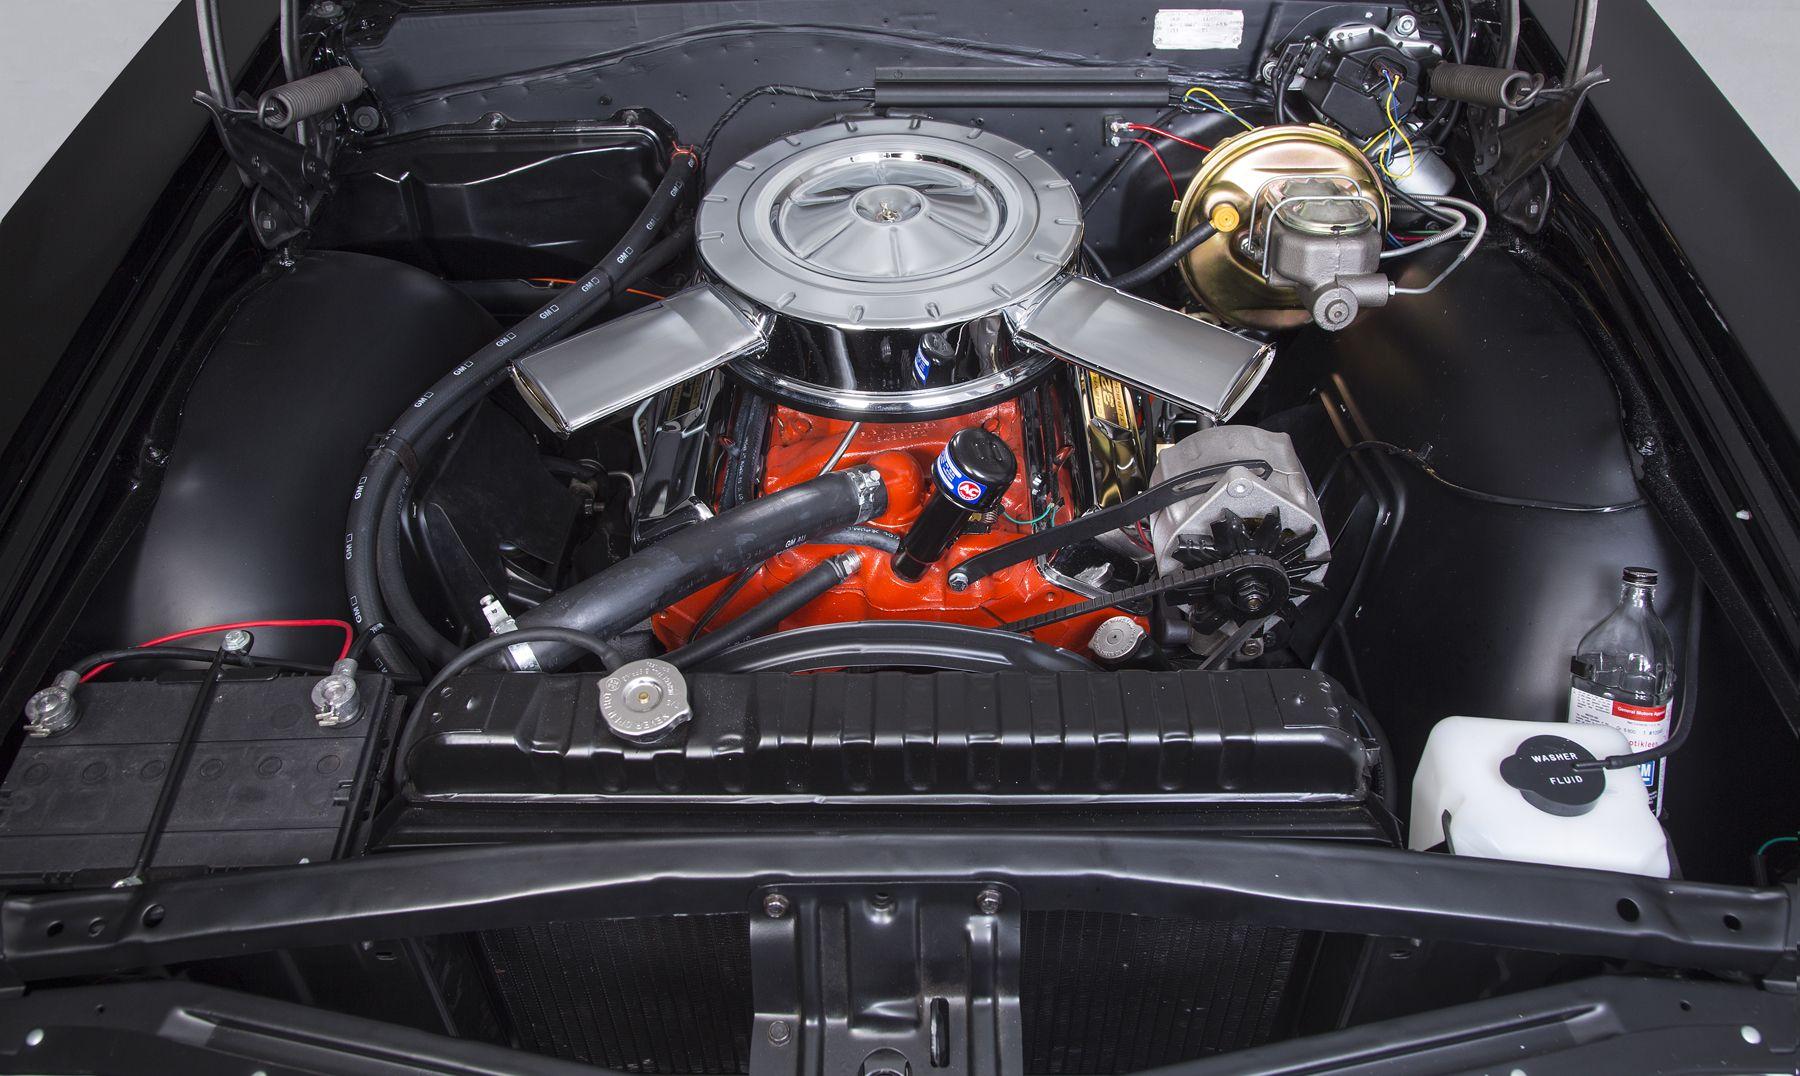 Pin On 307 327 350 Sbc Build